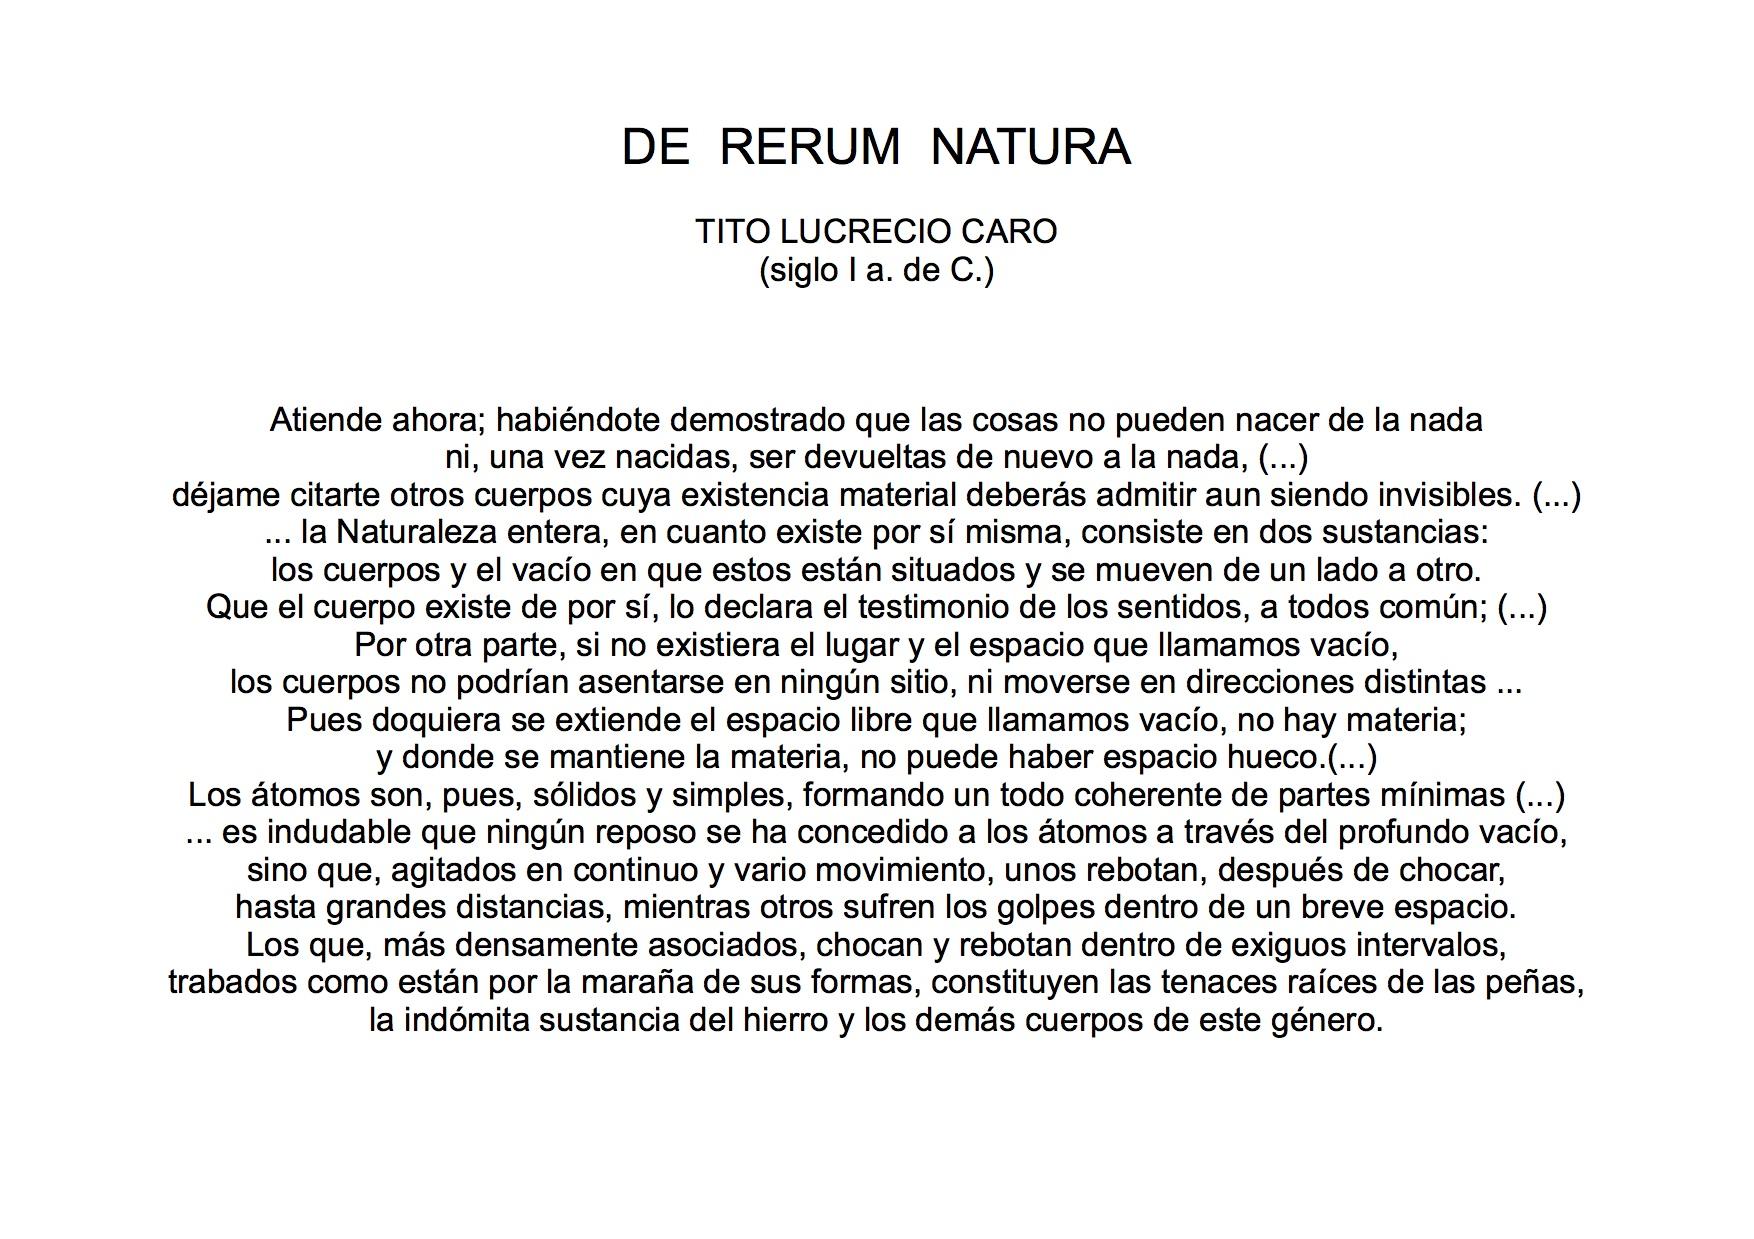 00-De Rerum Natura.jpg